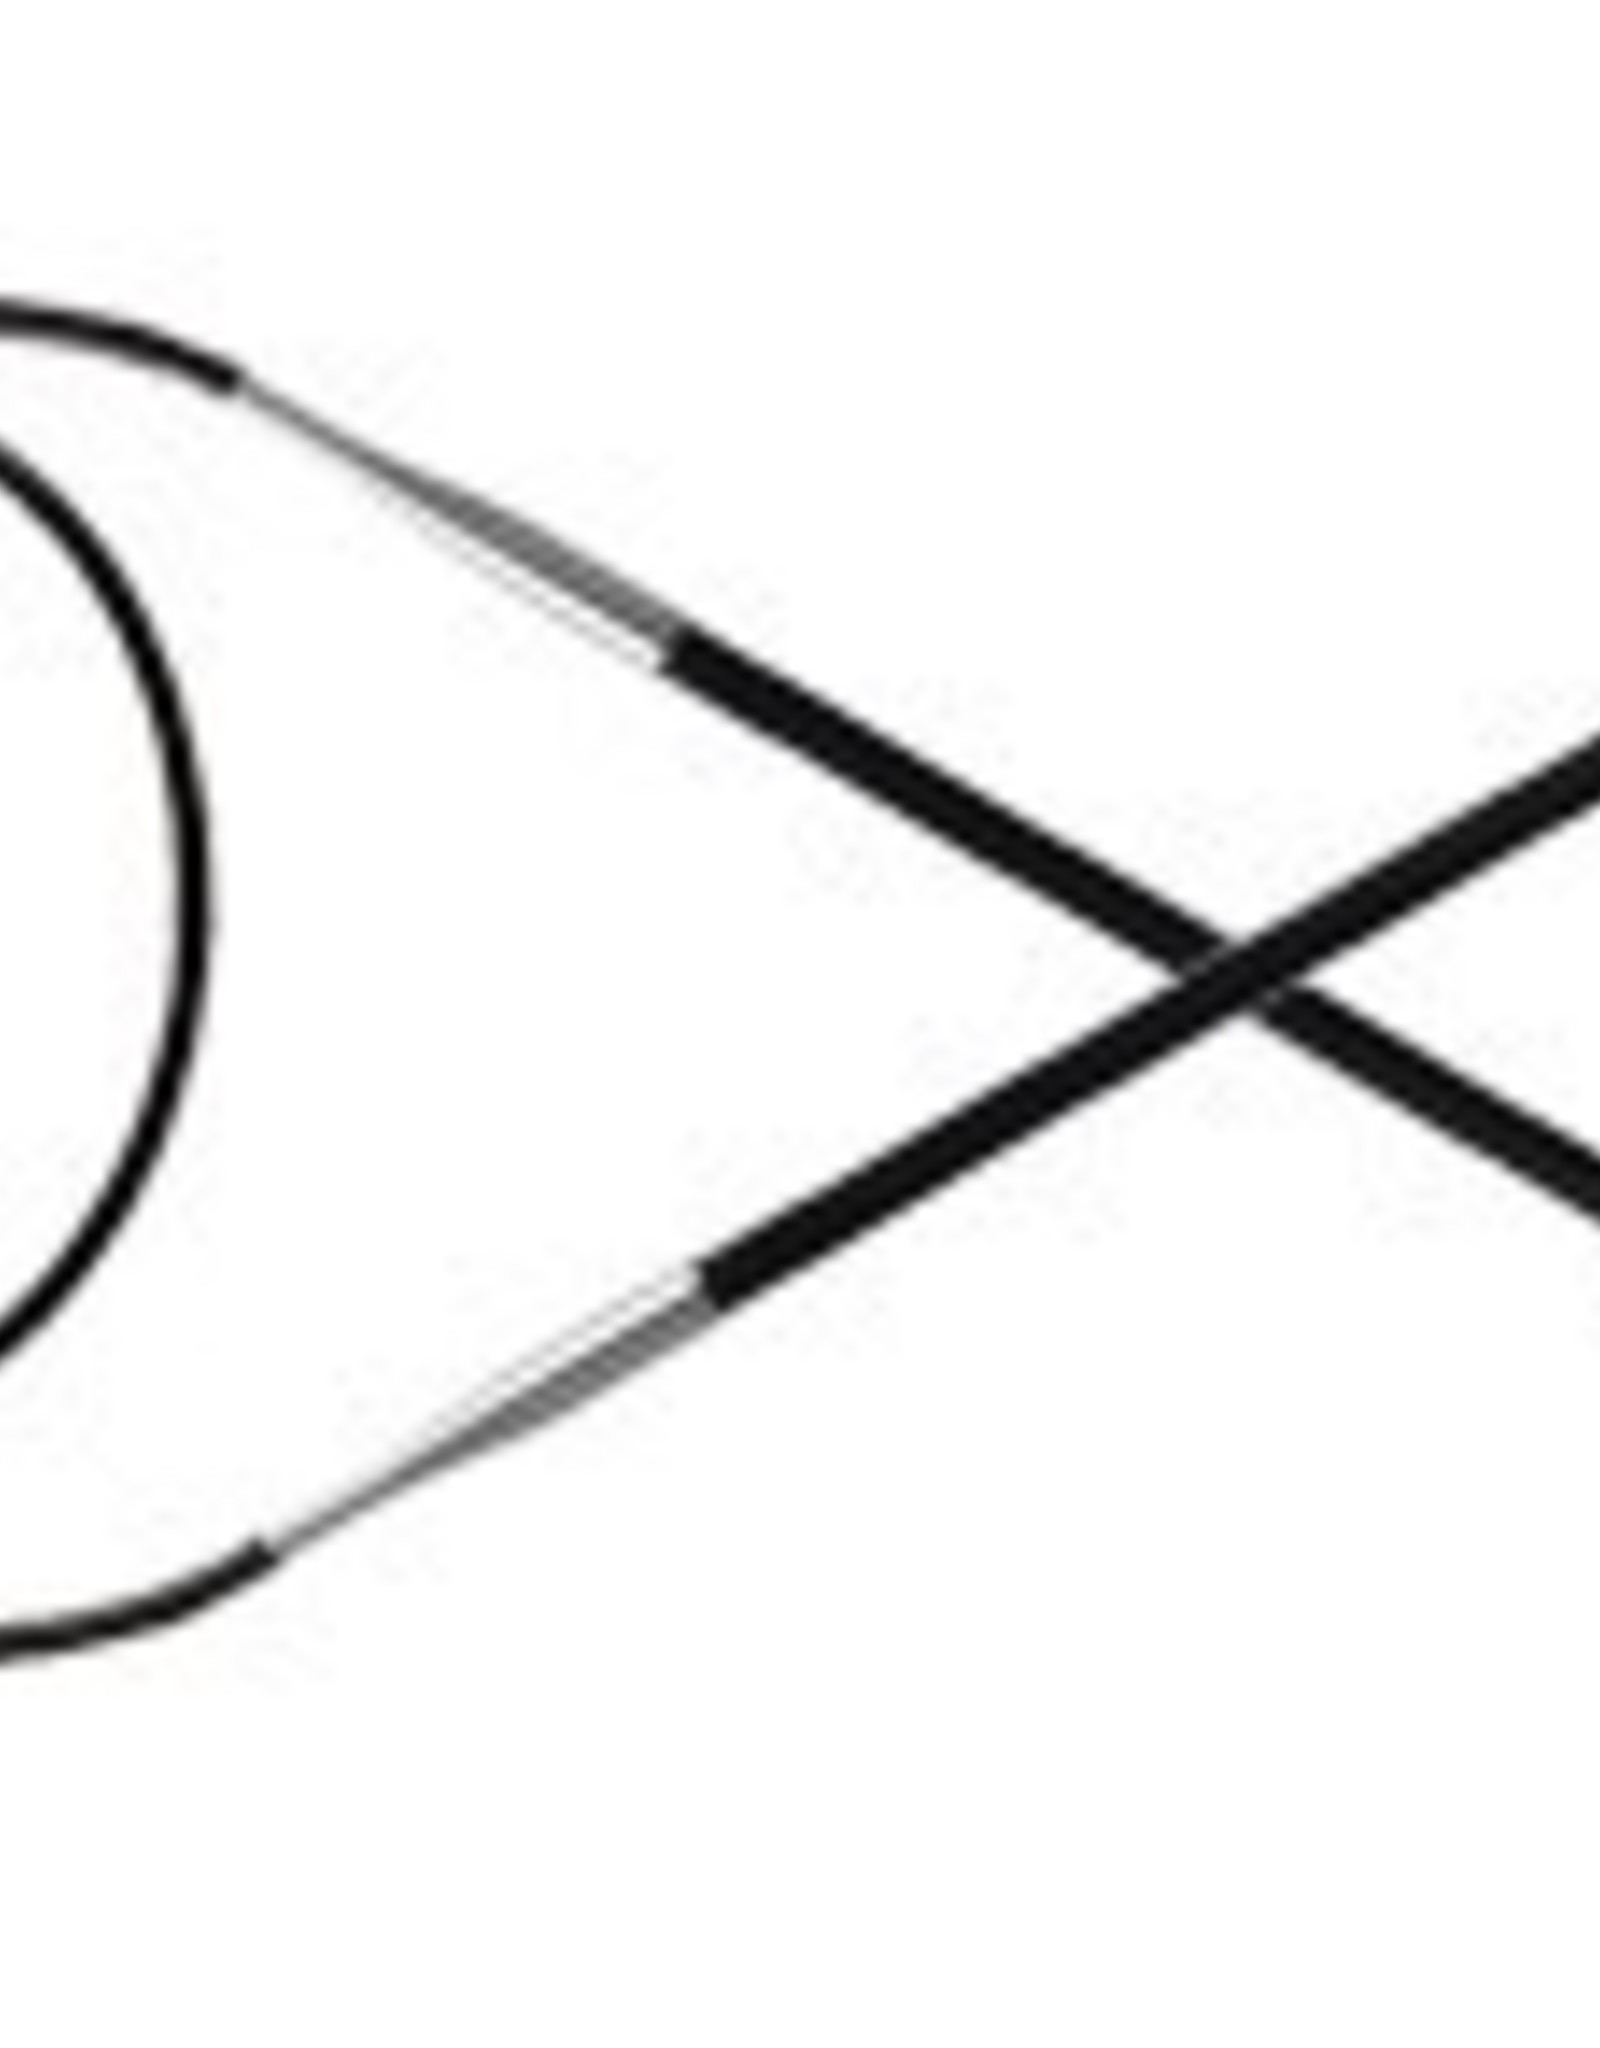 Knitter's Pride 2 Karbonz Circular 32